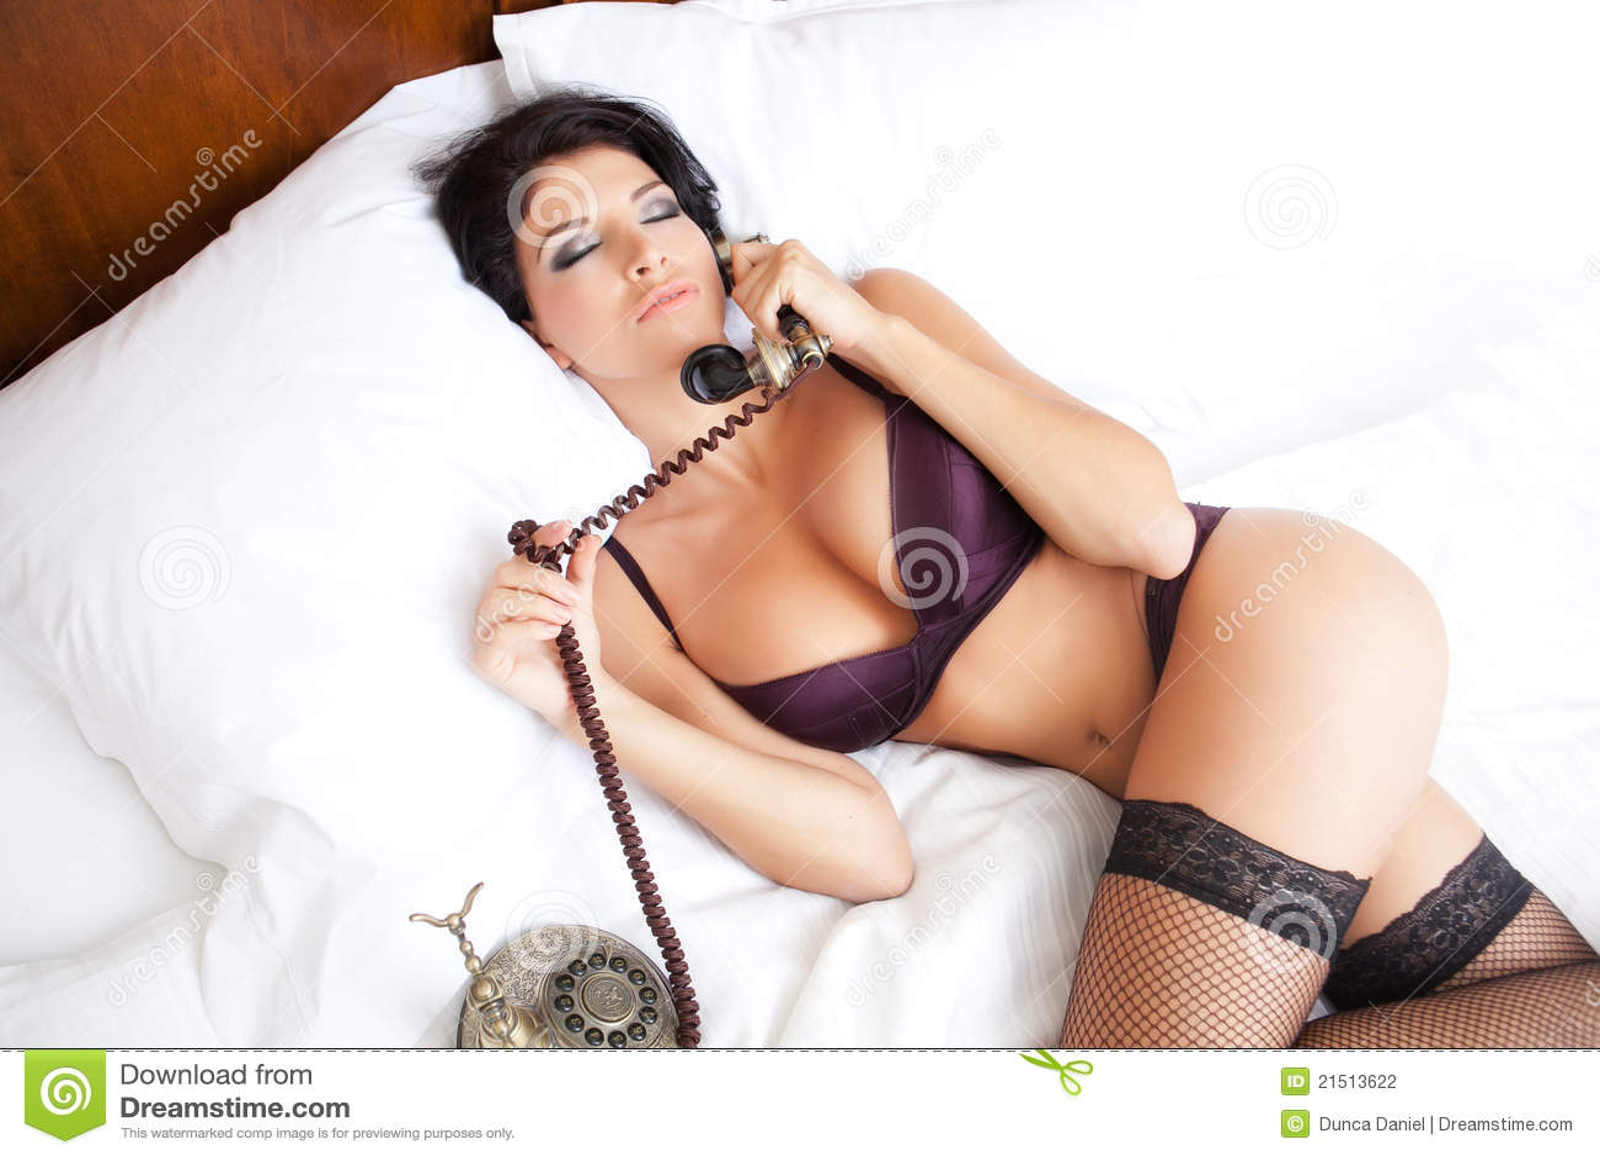 erotische massage voor de vrouw sexy massage sexy massage